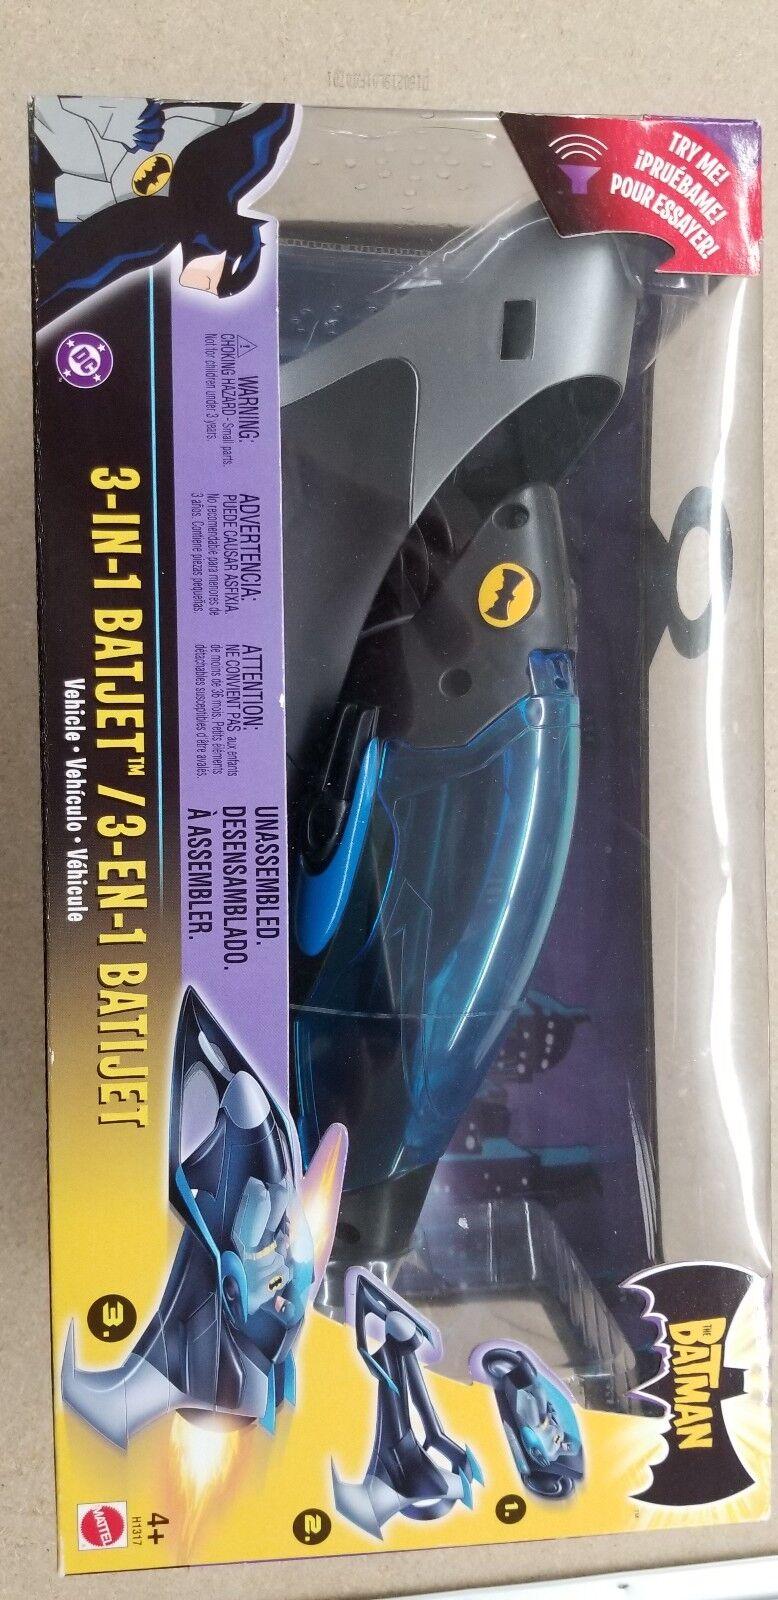 Batman WB Animated Series Vehicle Deluxe 3-In-1 Batjet Batplane Mattel H1317